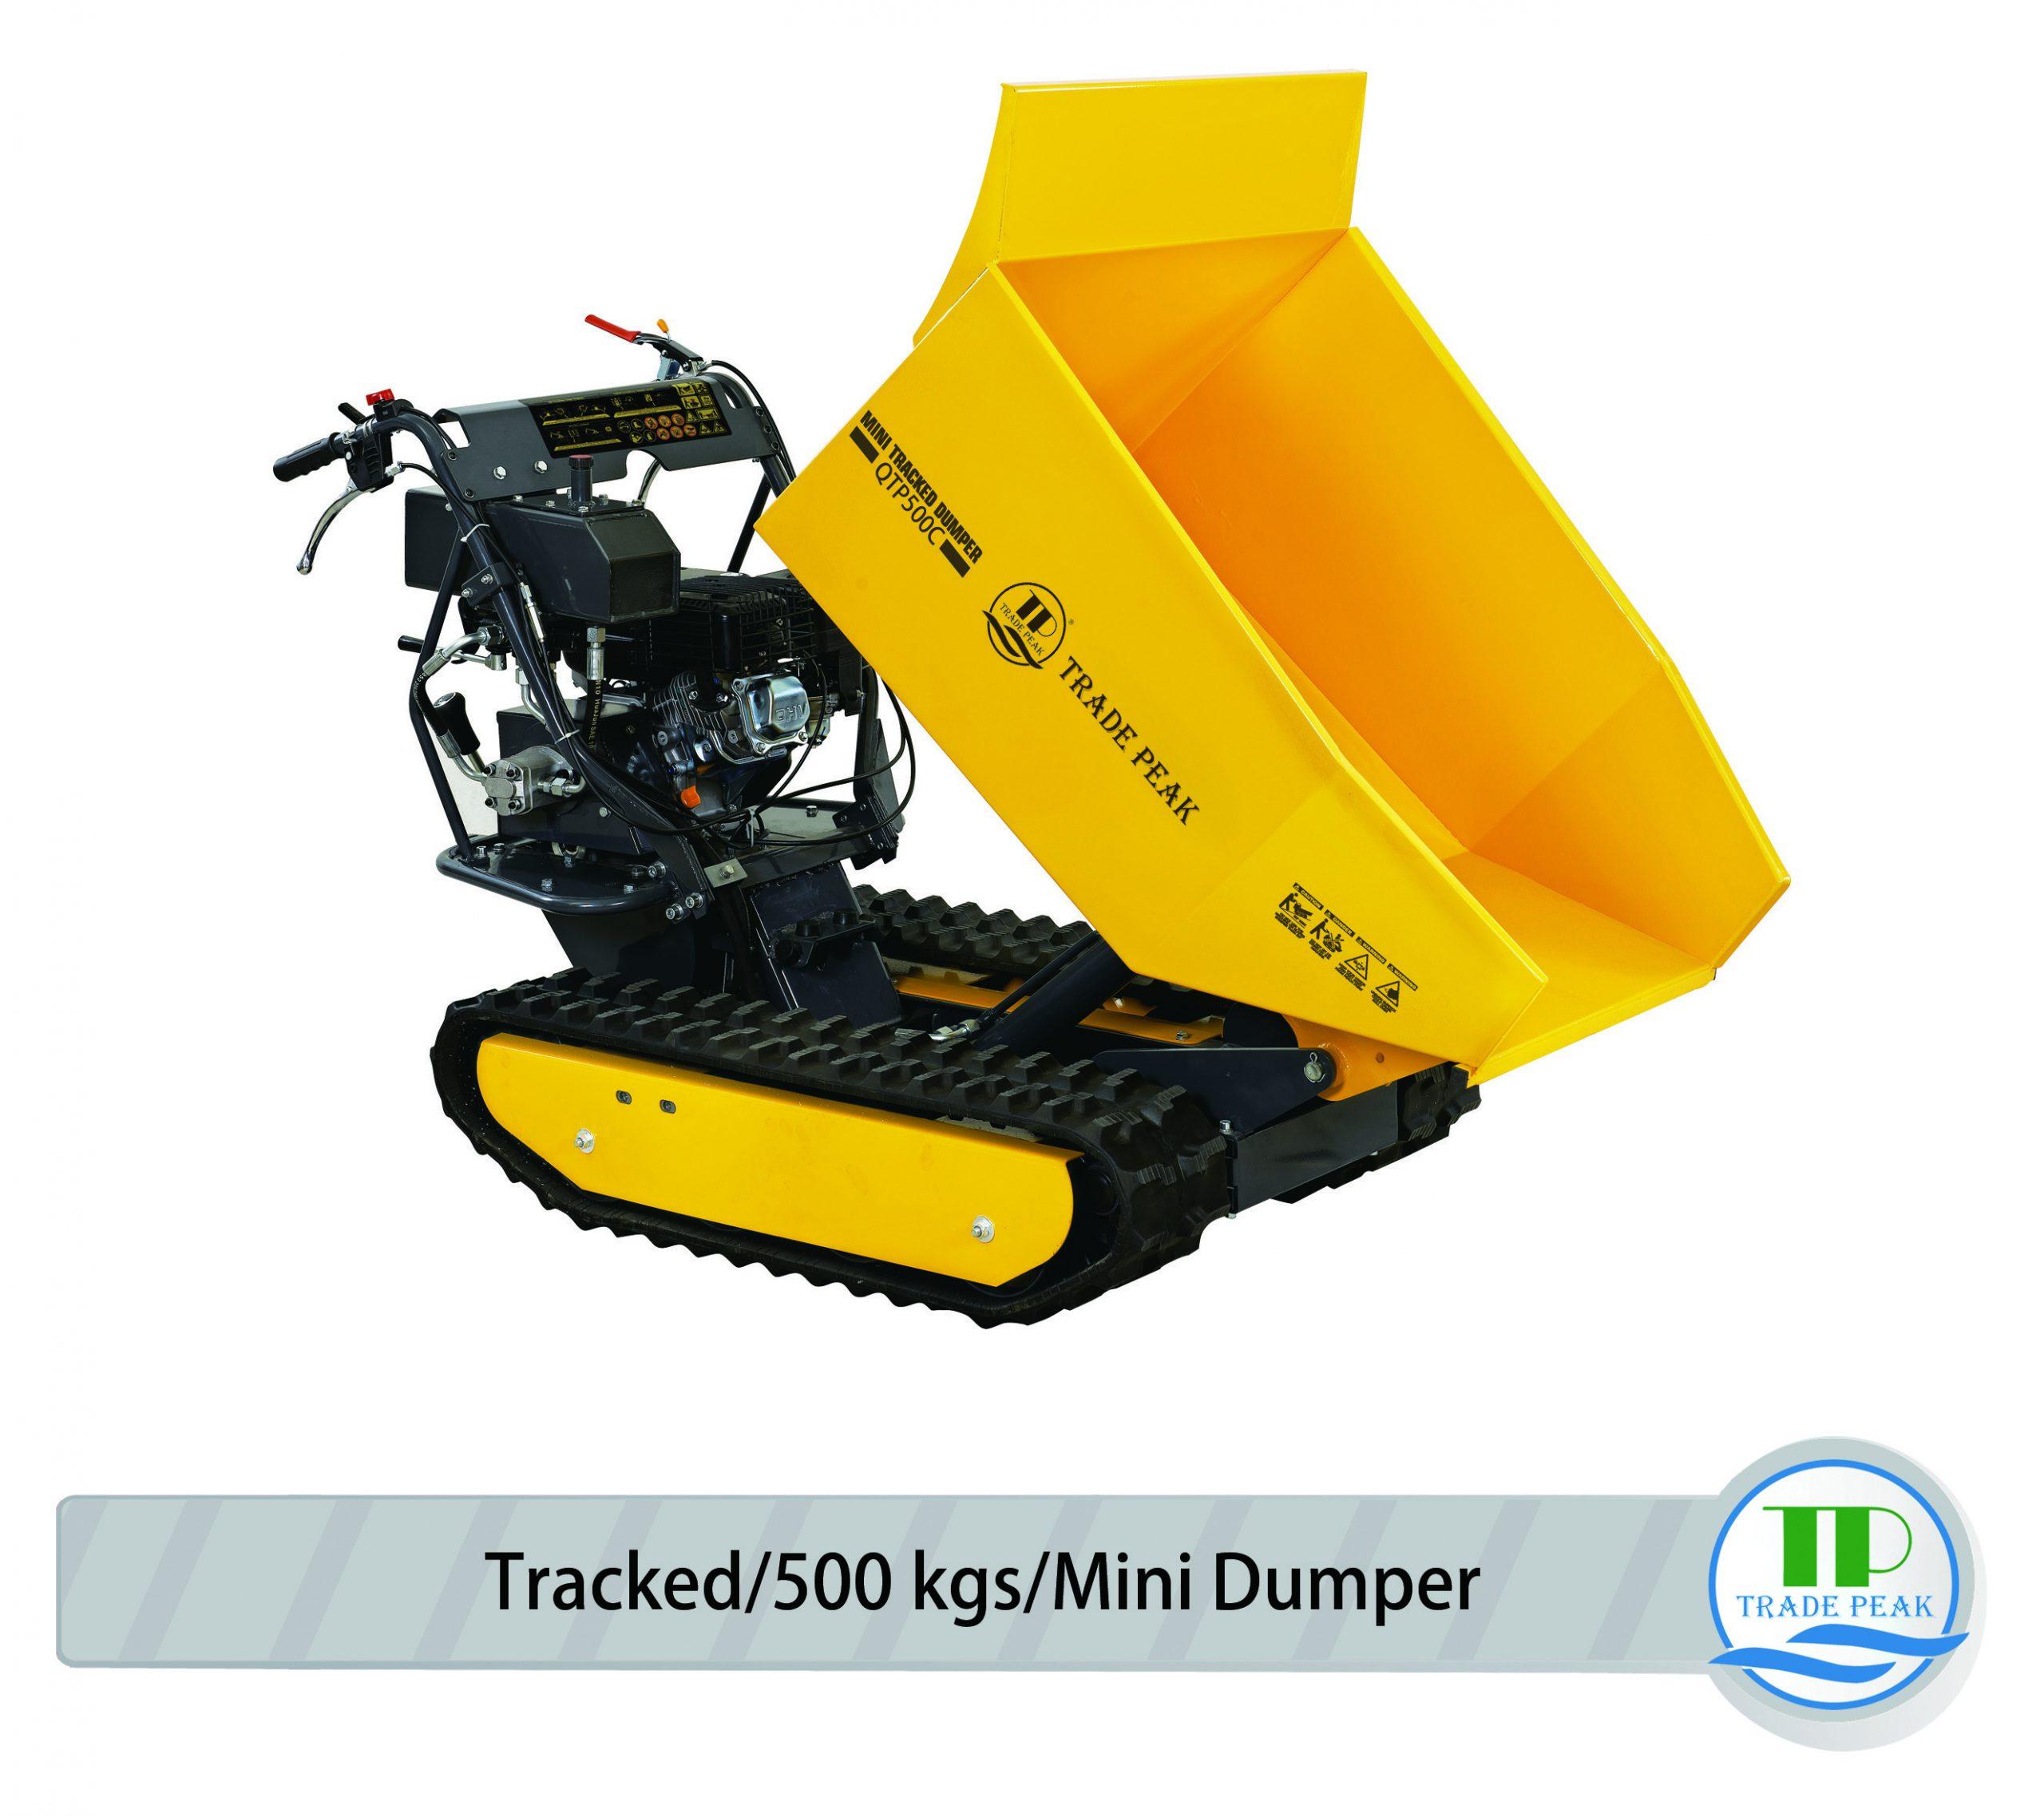 tracked mini dumper